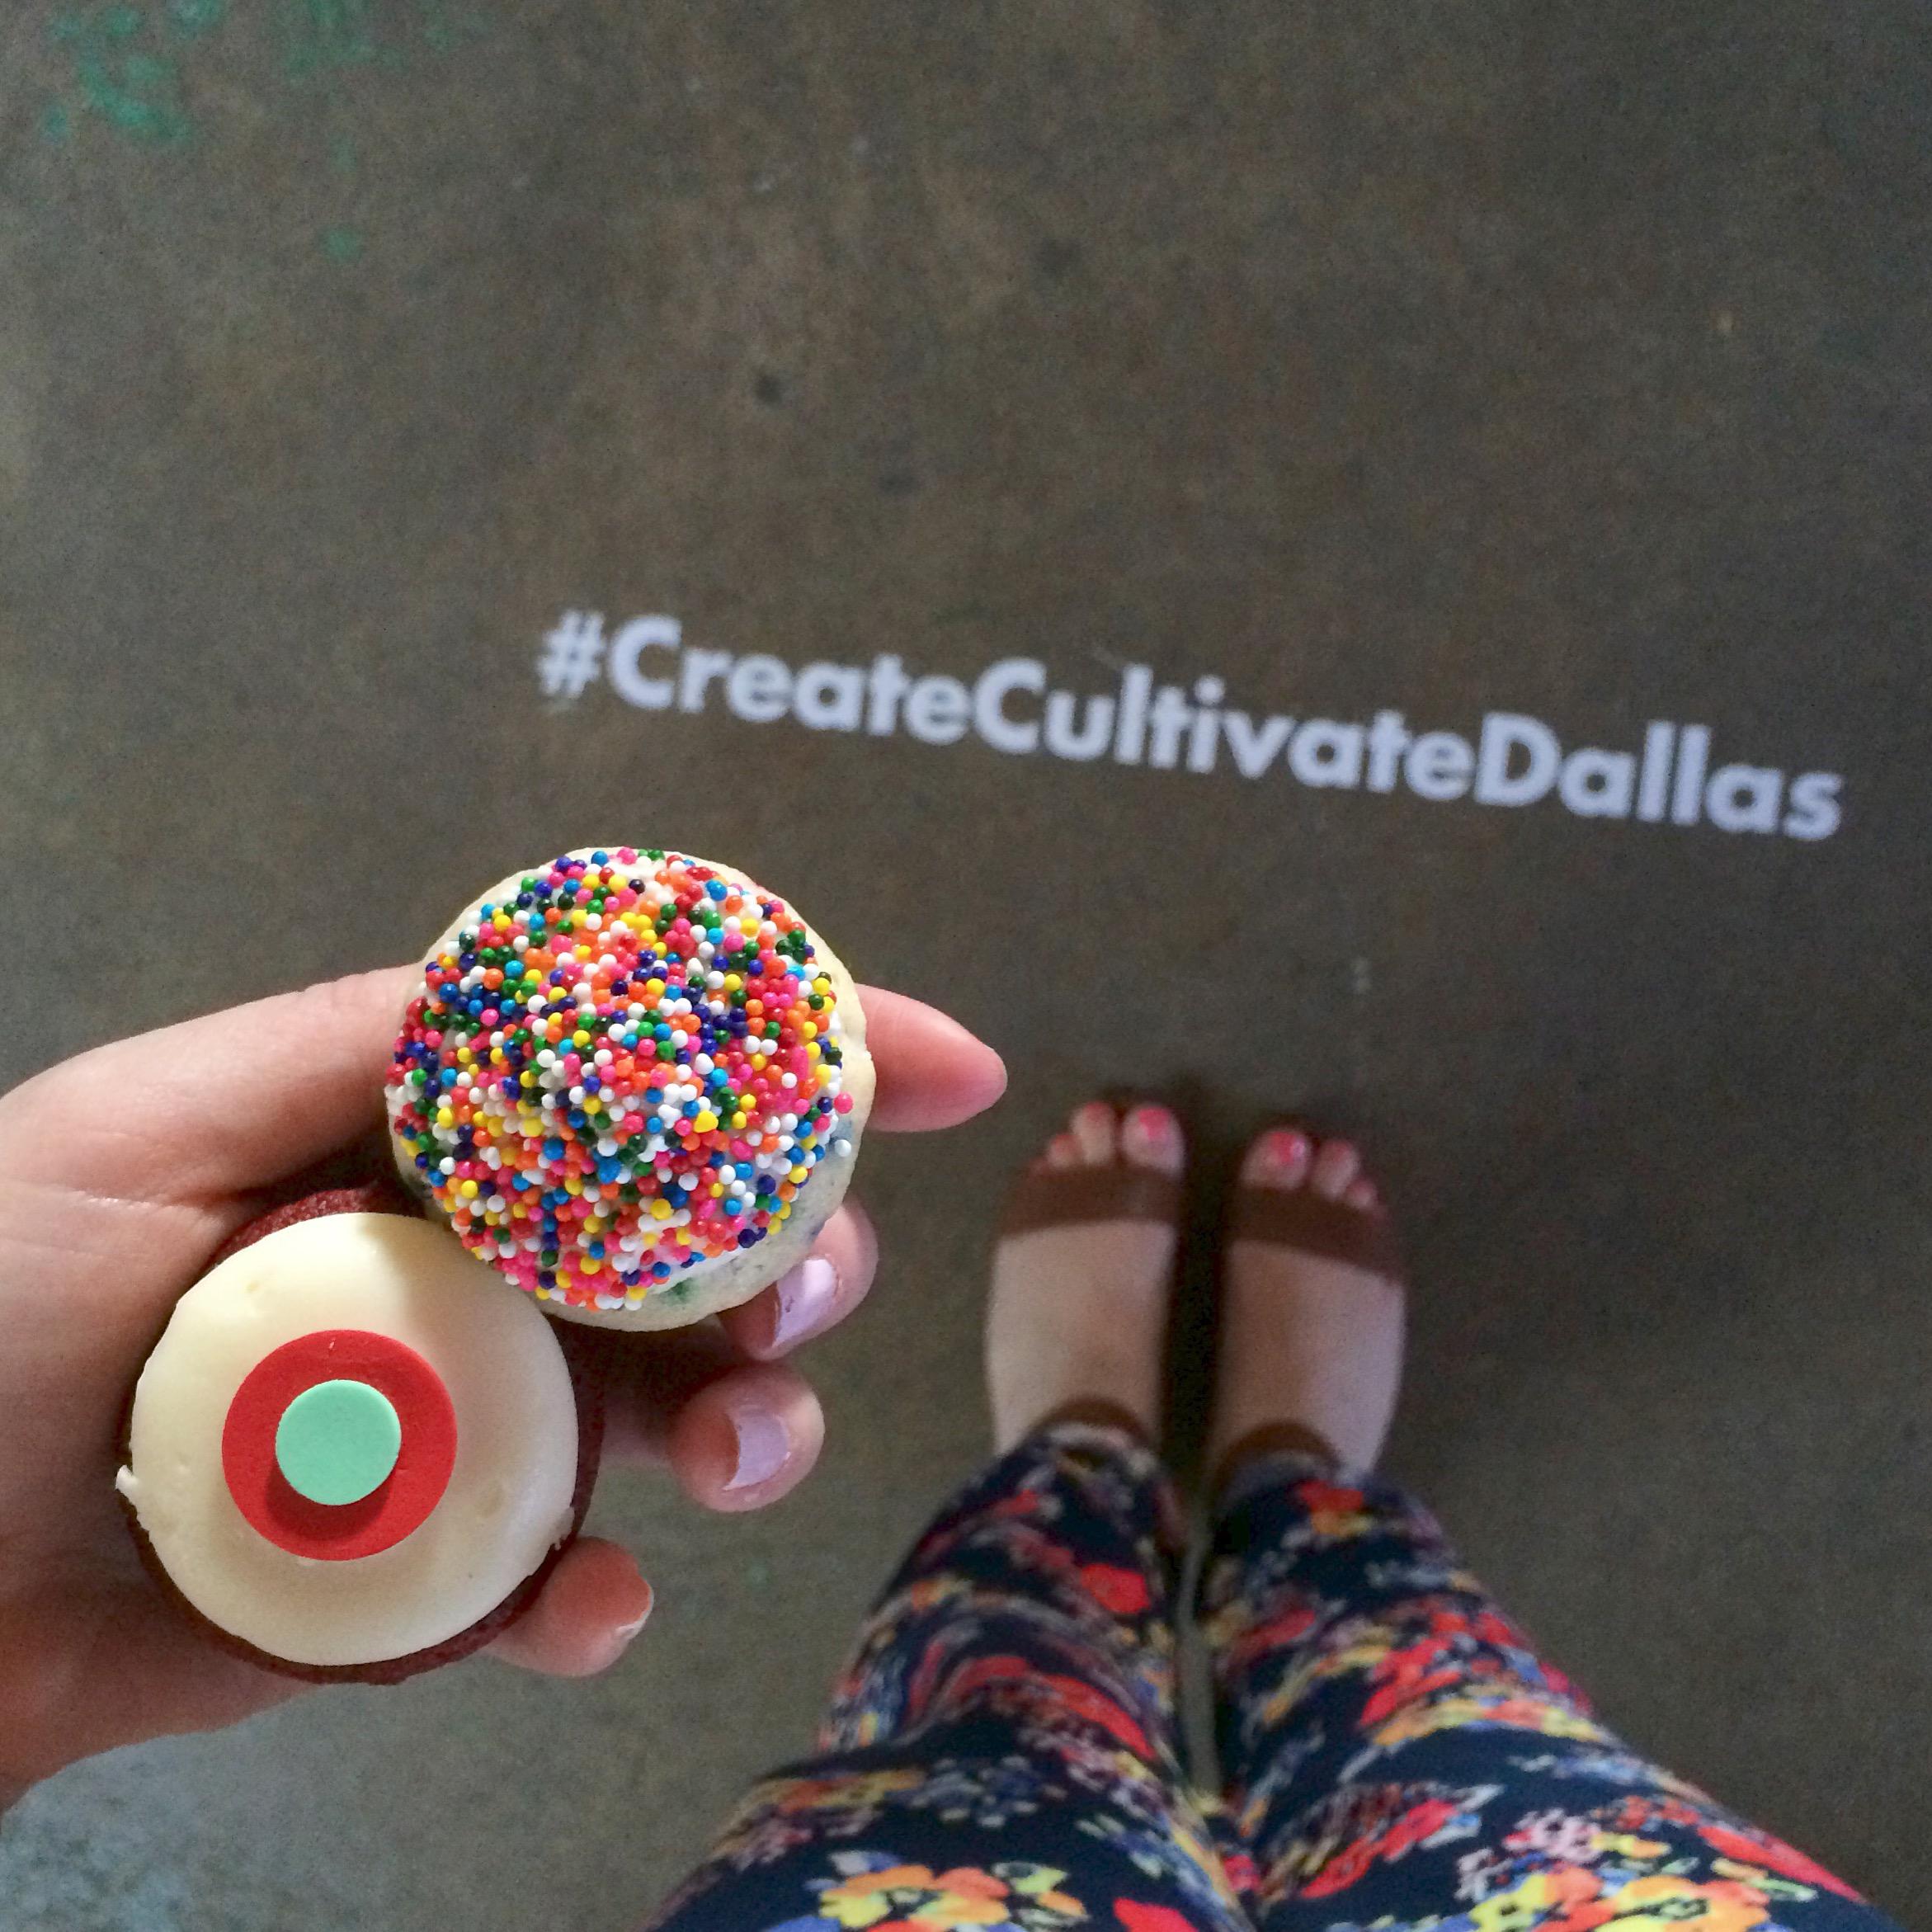 Cupcake break = best kind of break.